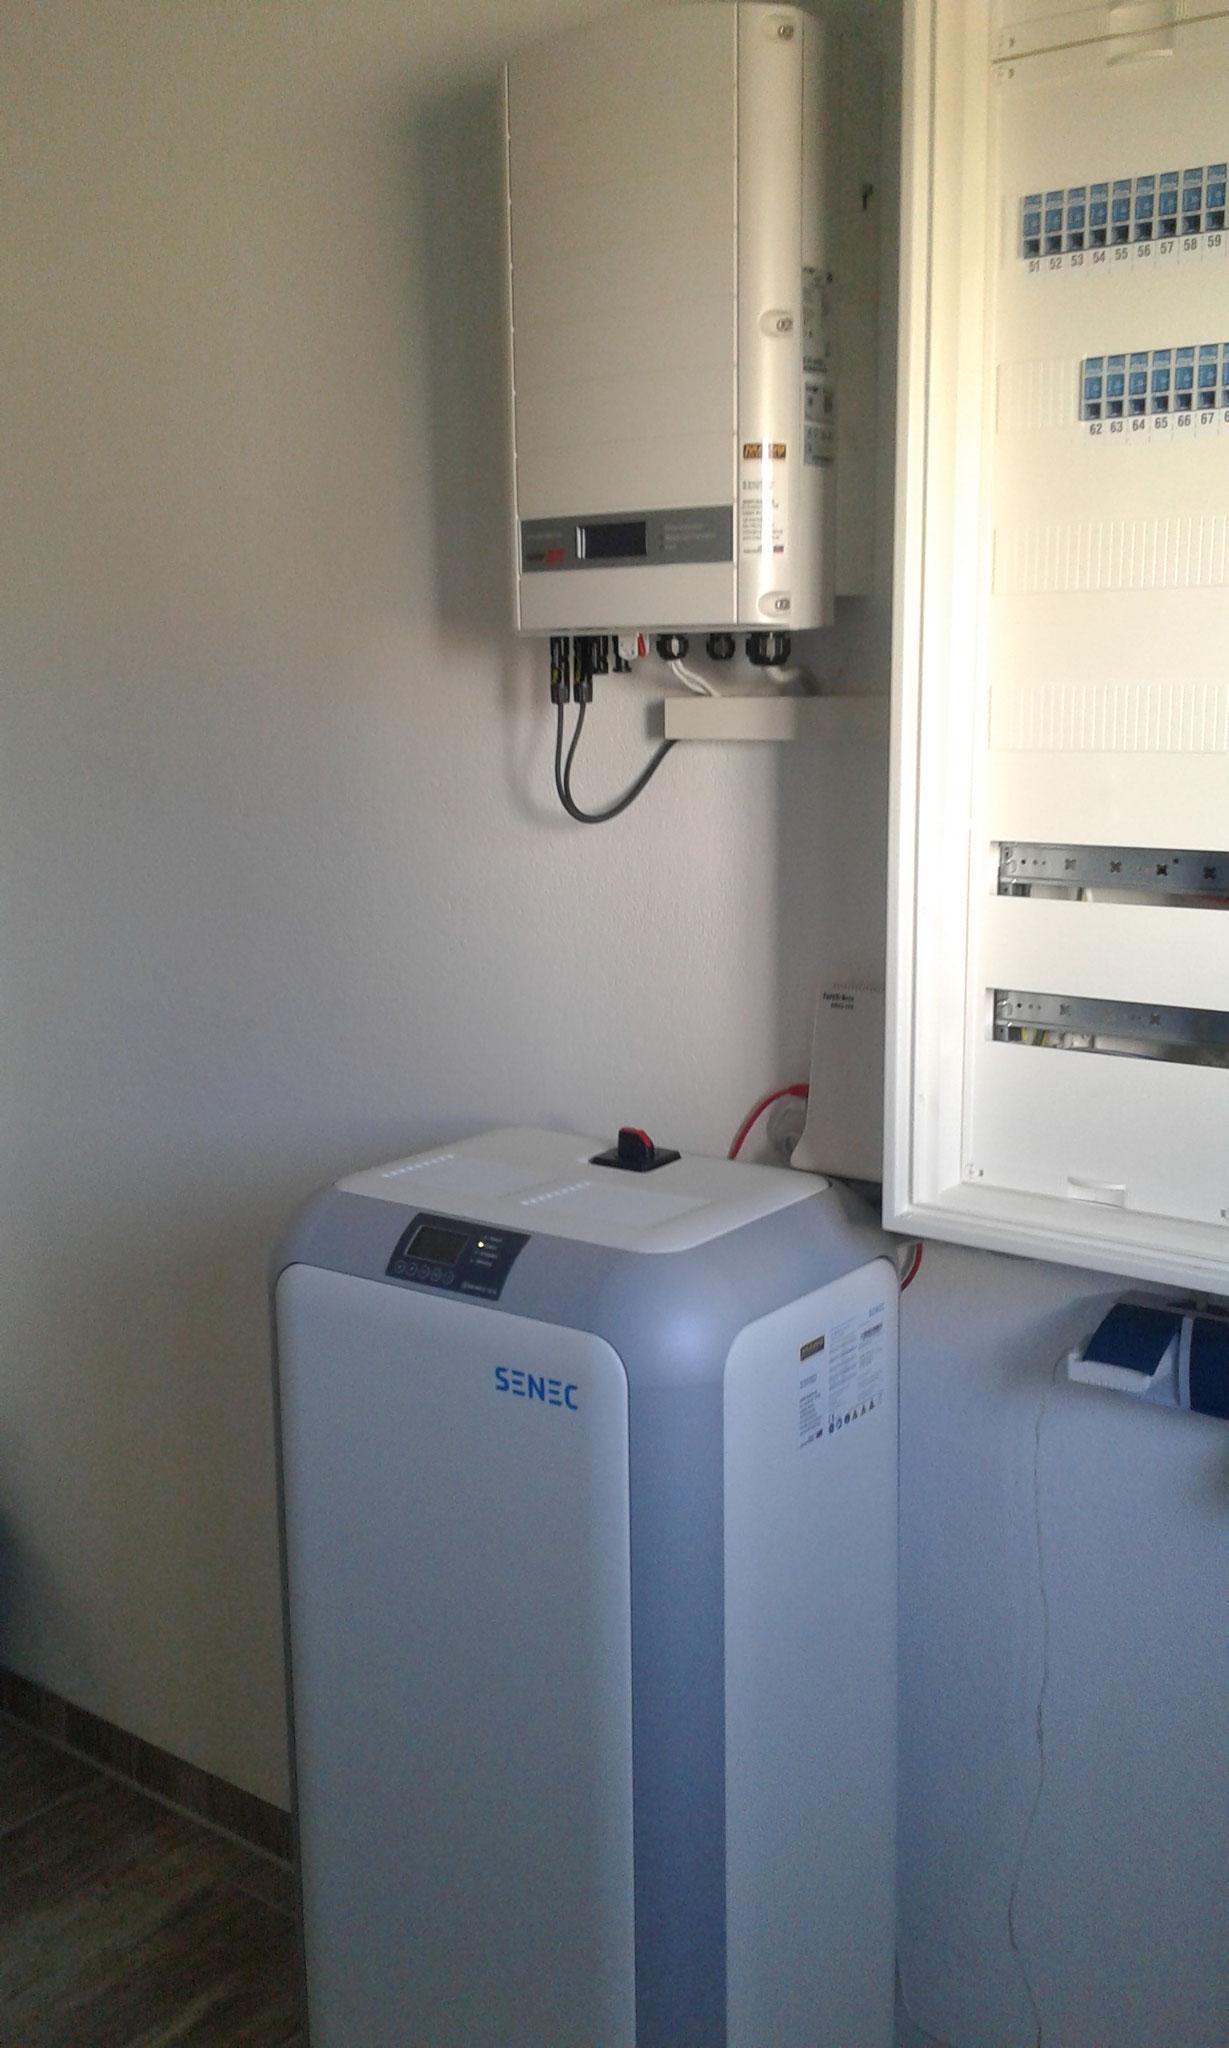 10 kWh Senec Speicher in Satow